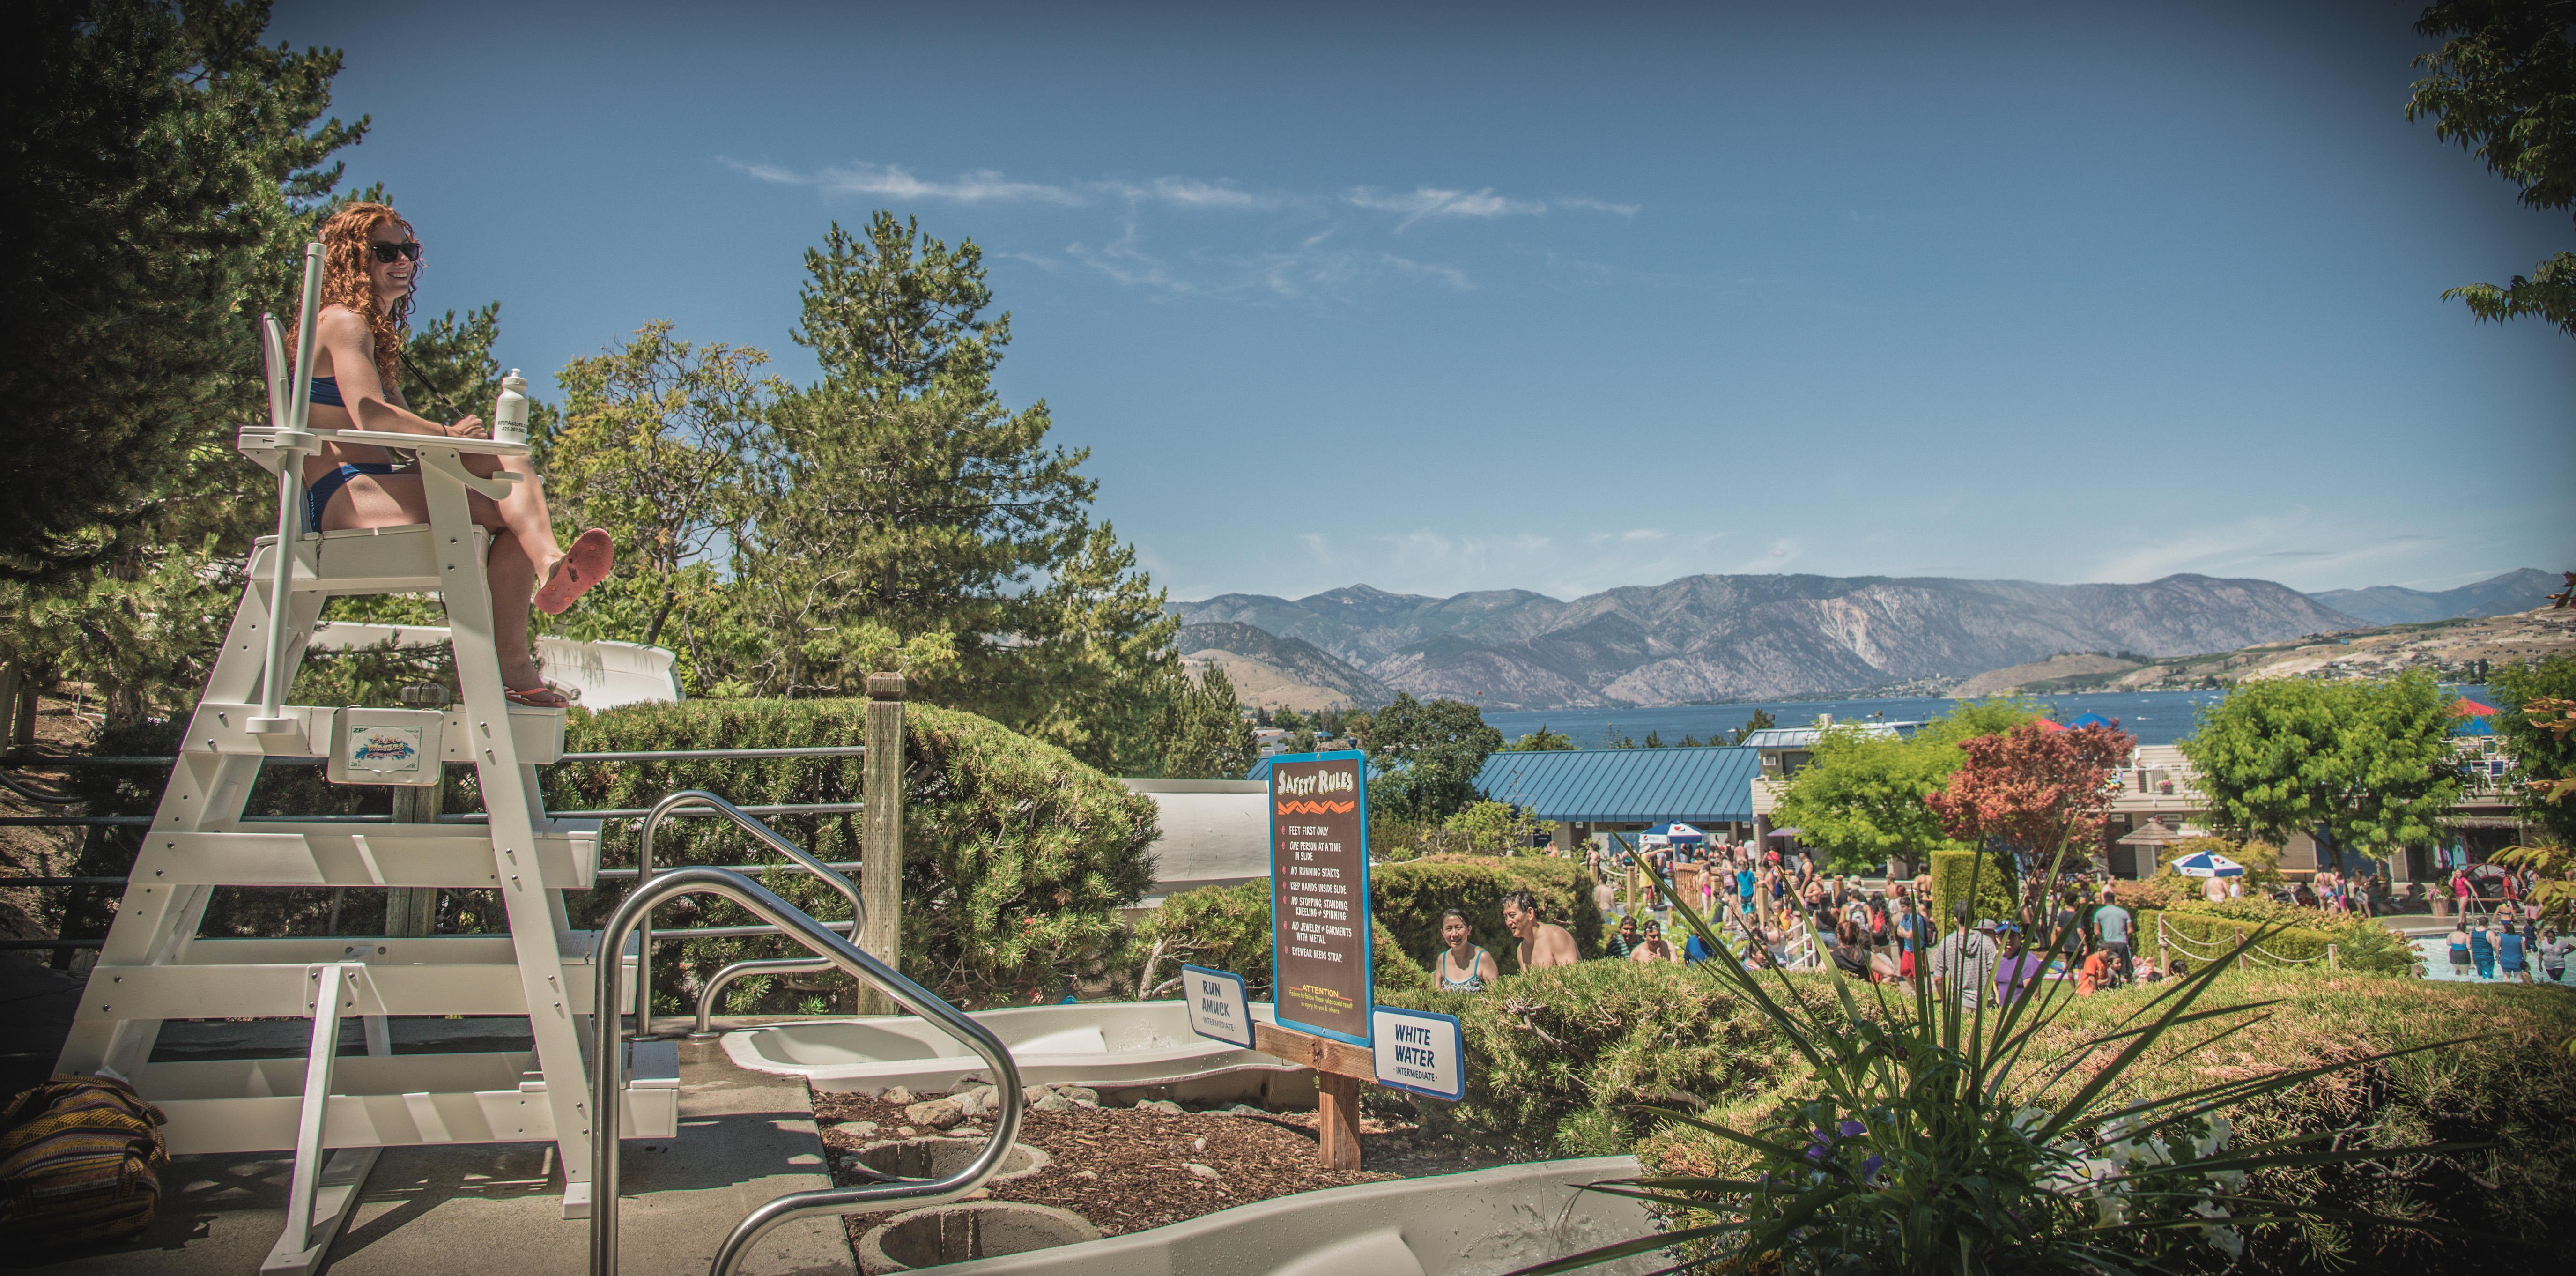 Slidewaters Waterpark, a family-friendly waterpark